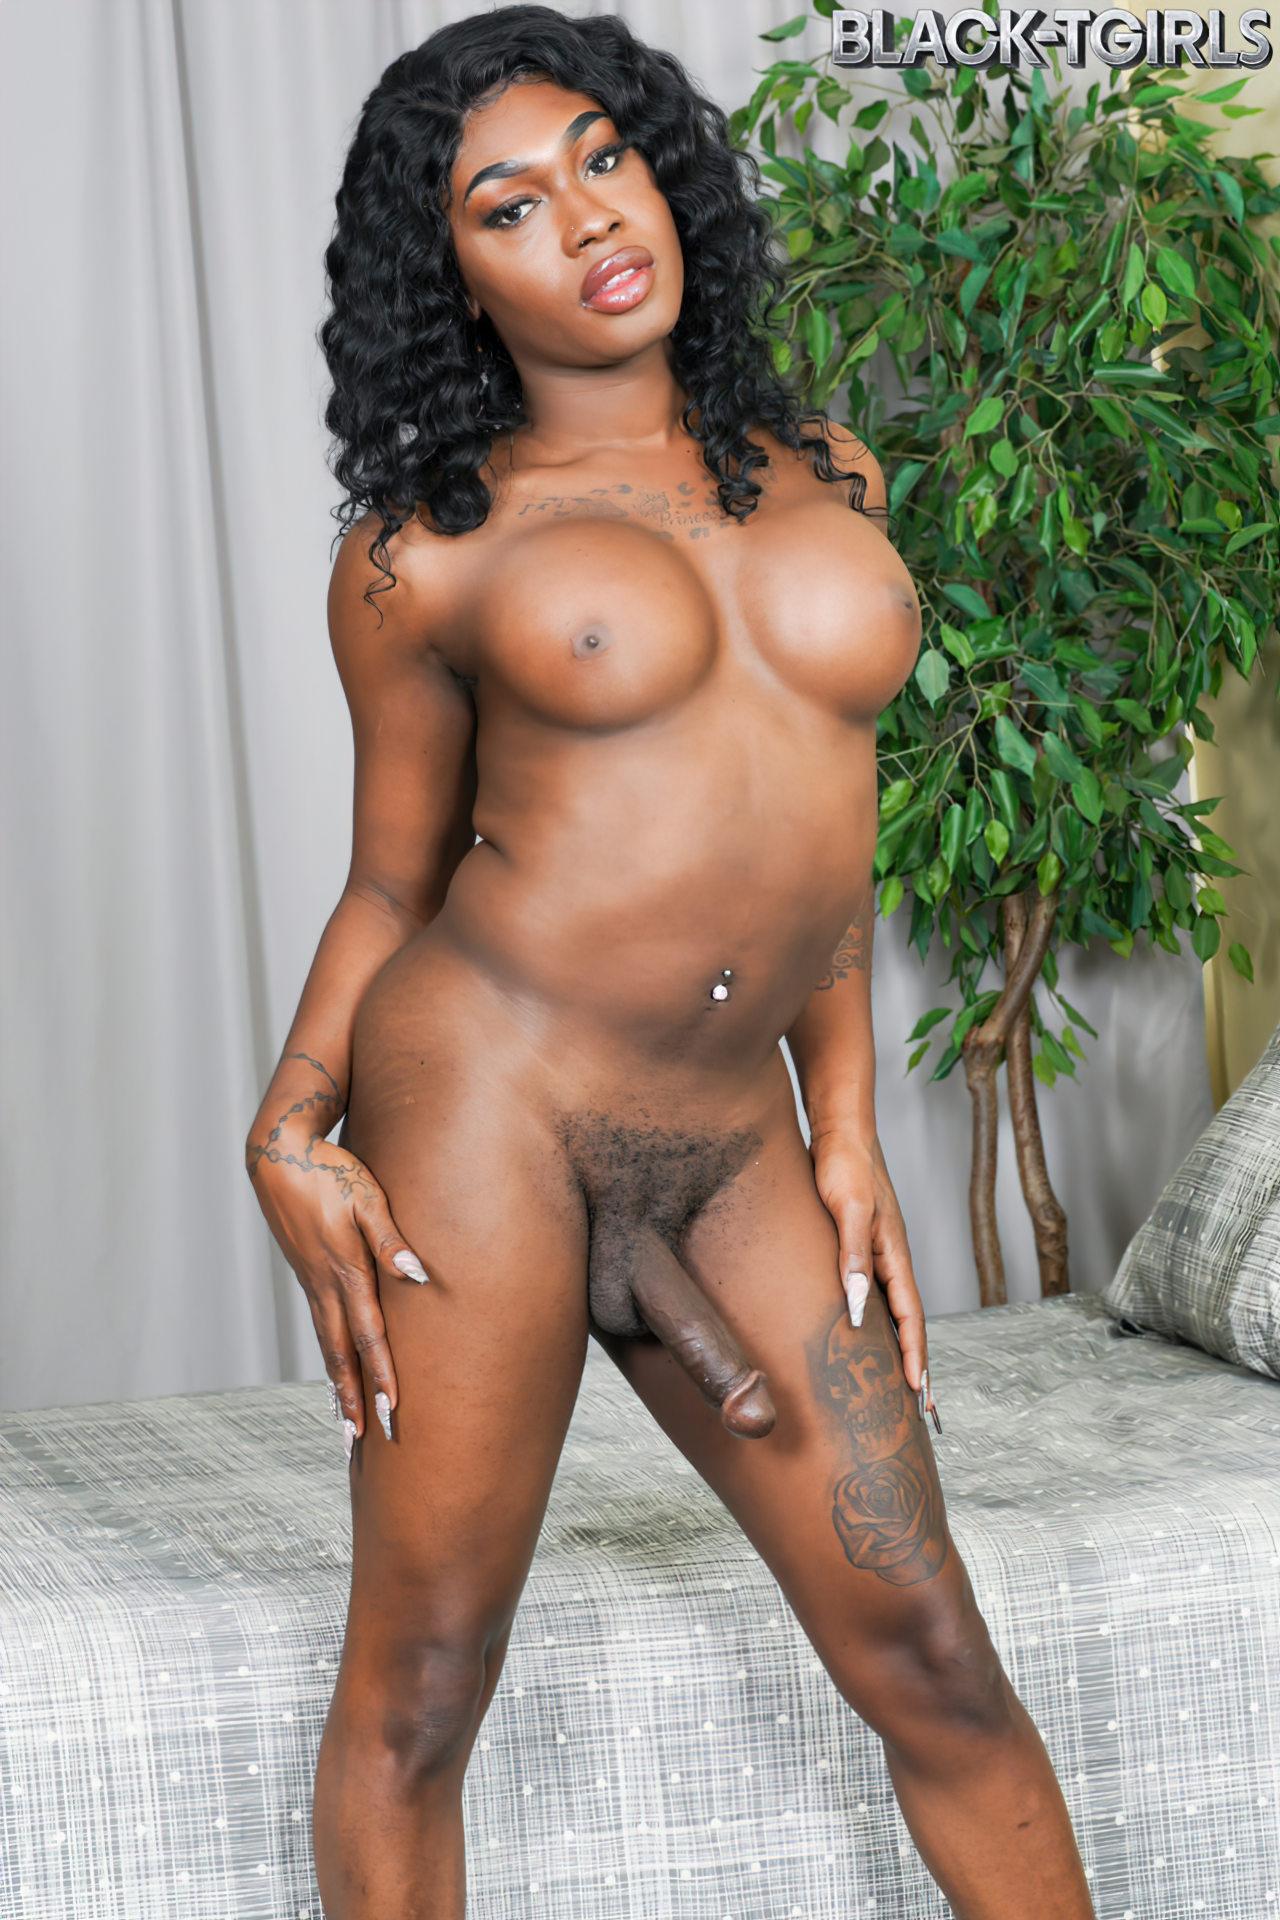 Trans Negra Gostosa (10)